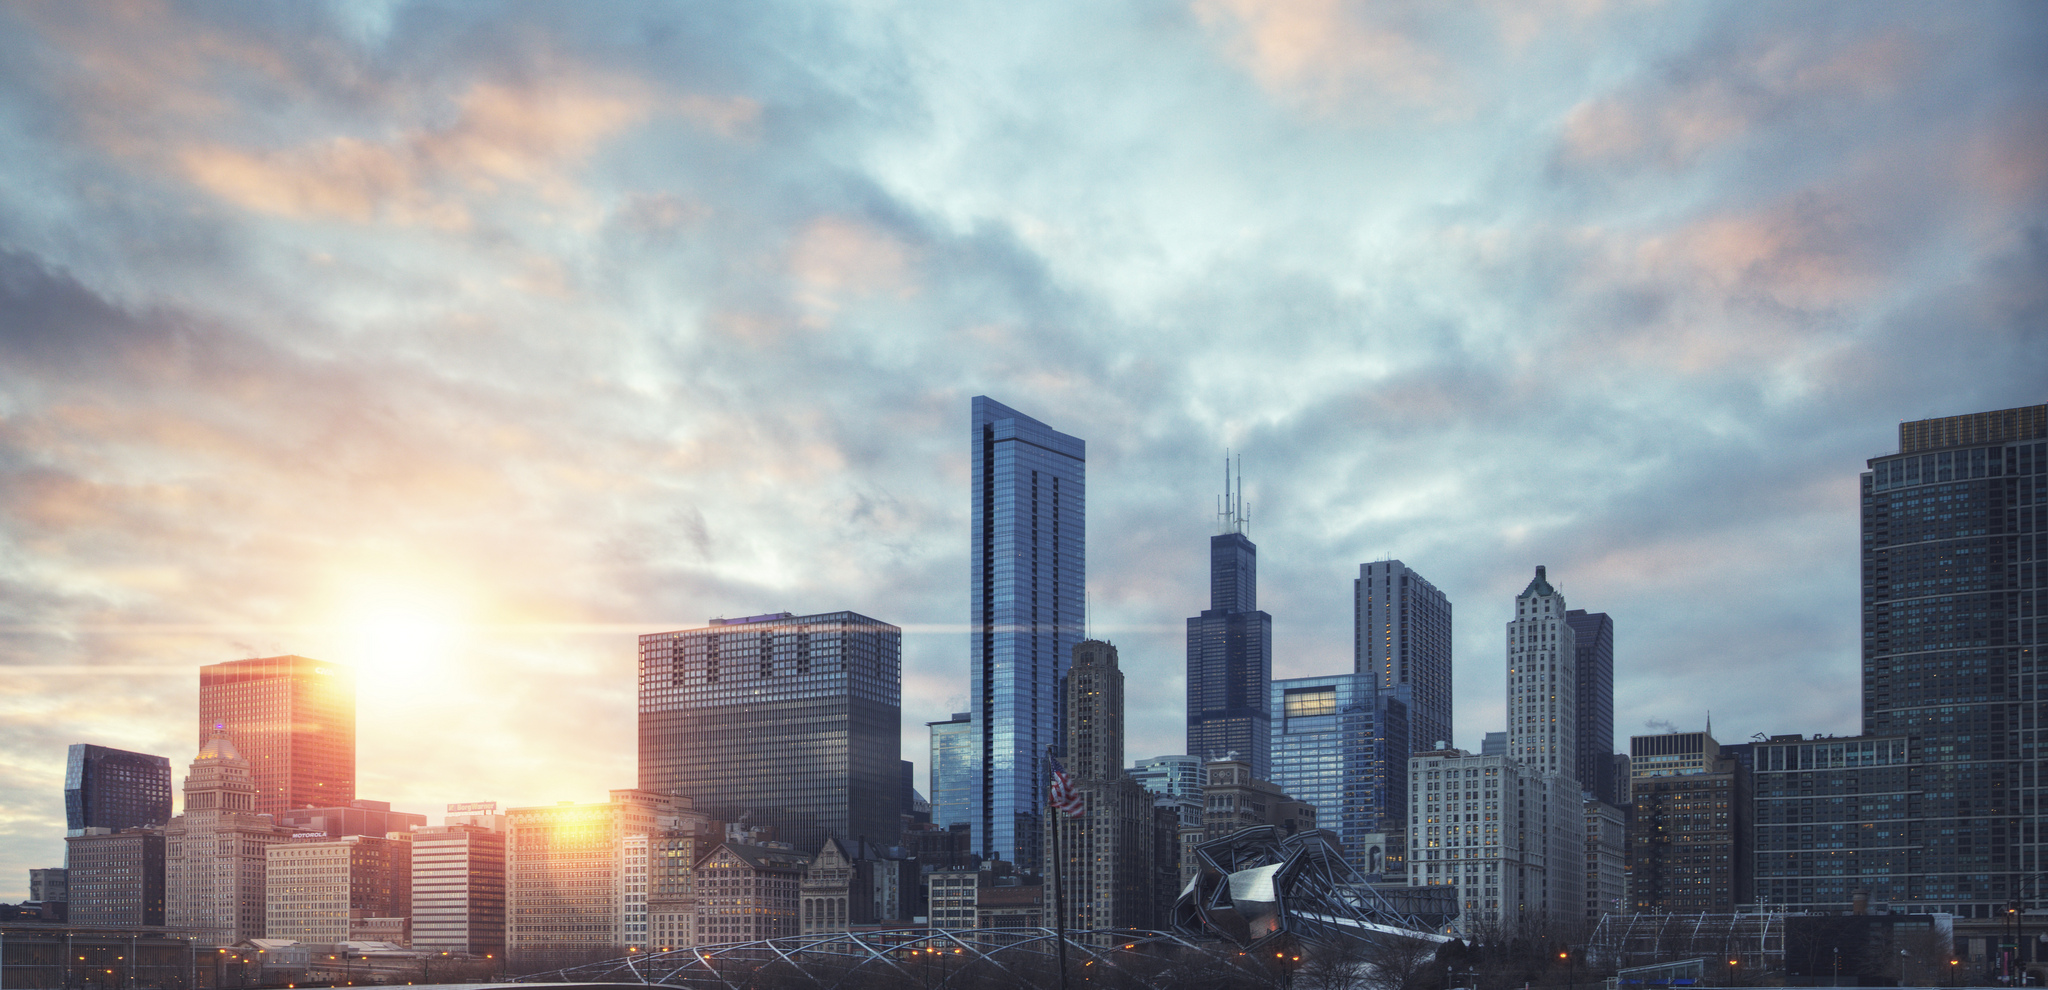 Jeremy VanderMeer - Chicago Sunset